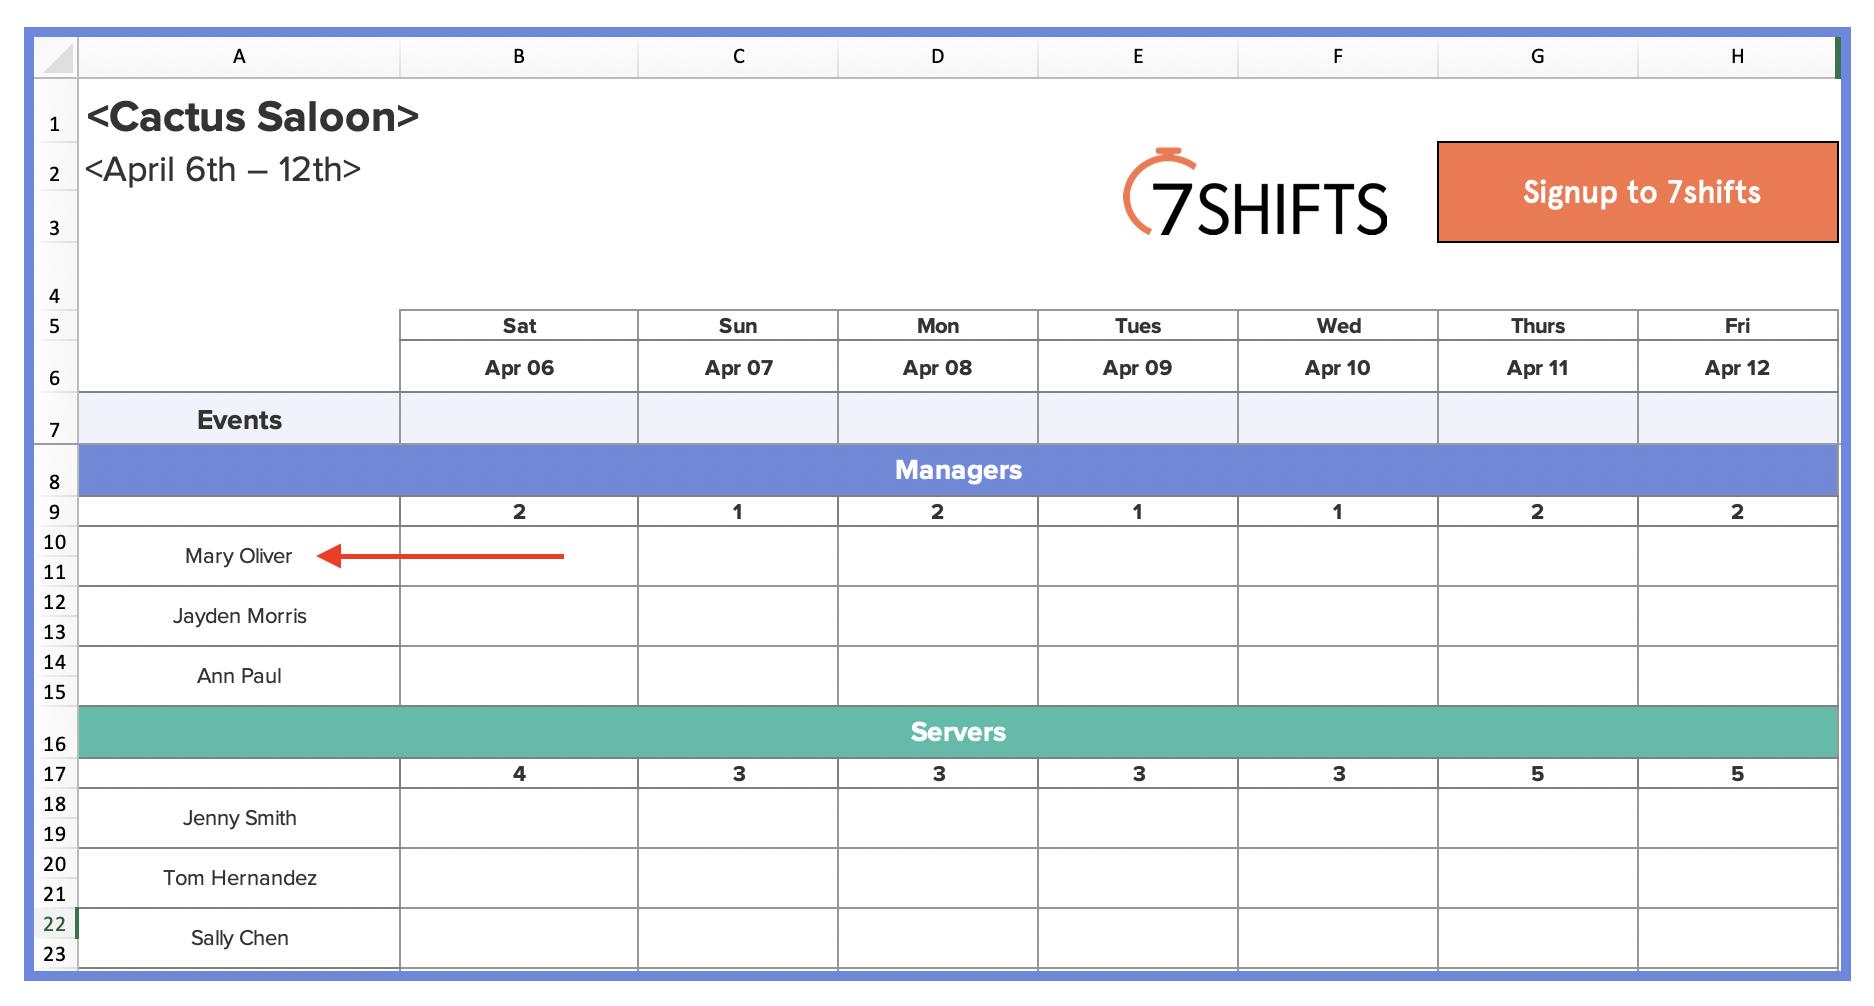 3-restaurant-scheduling-excel-template